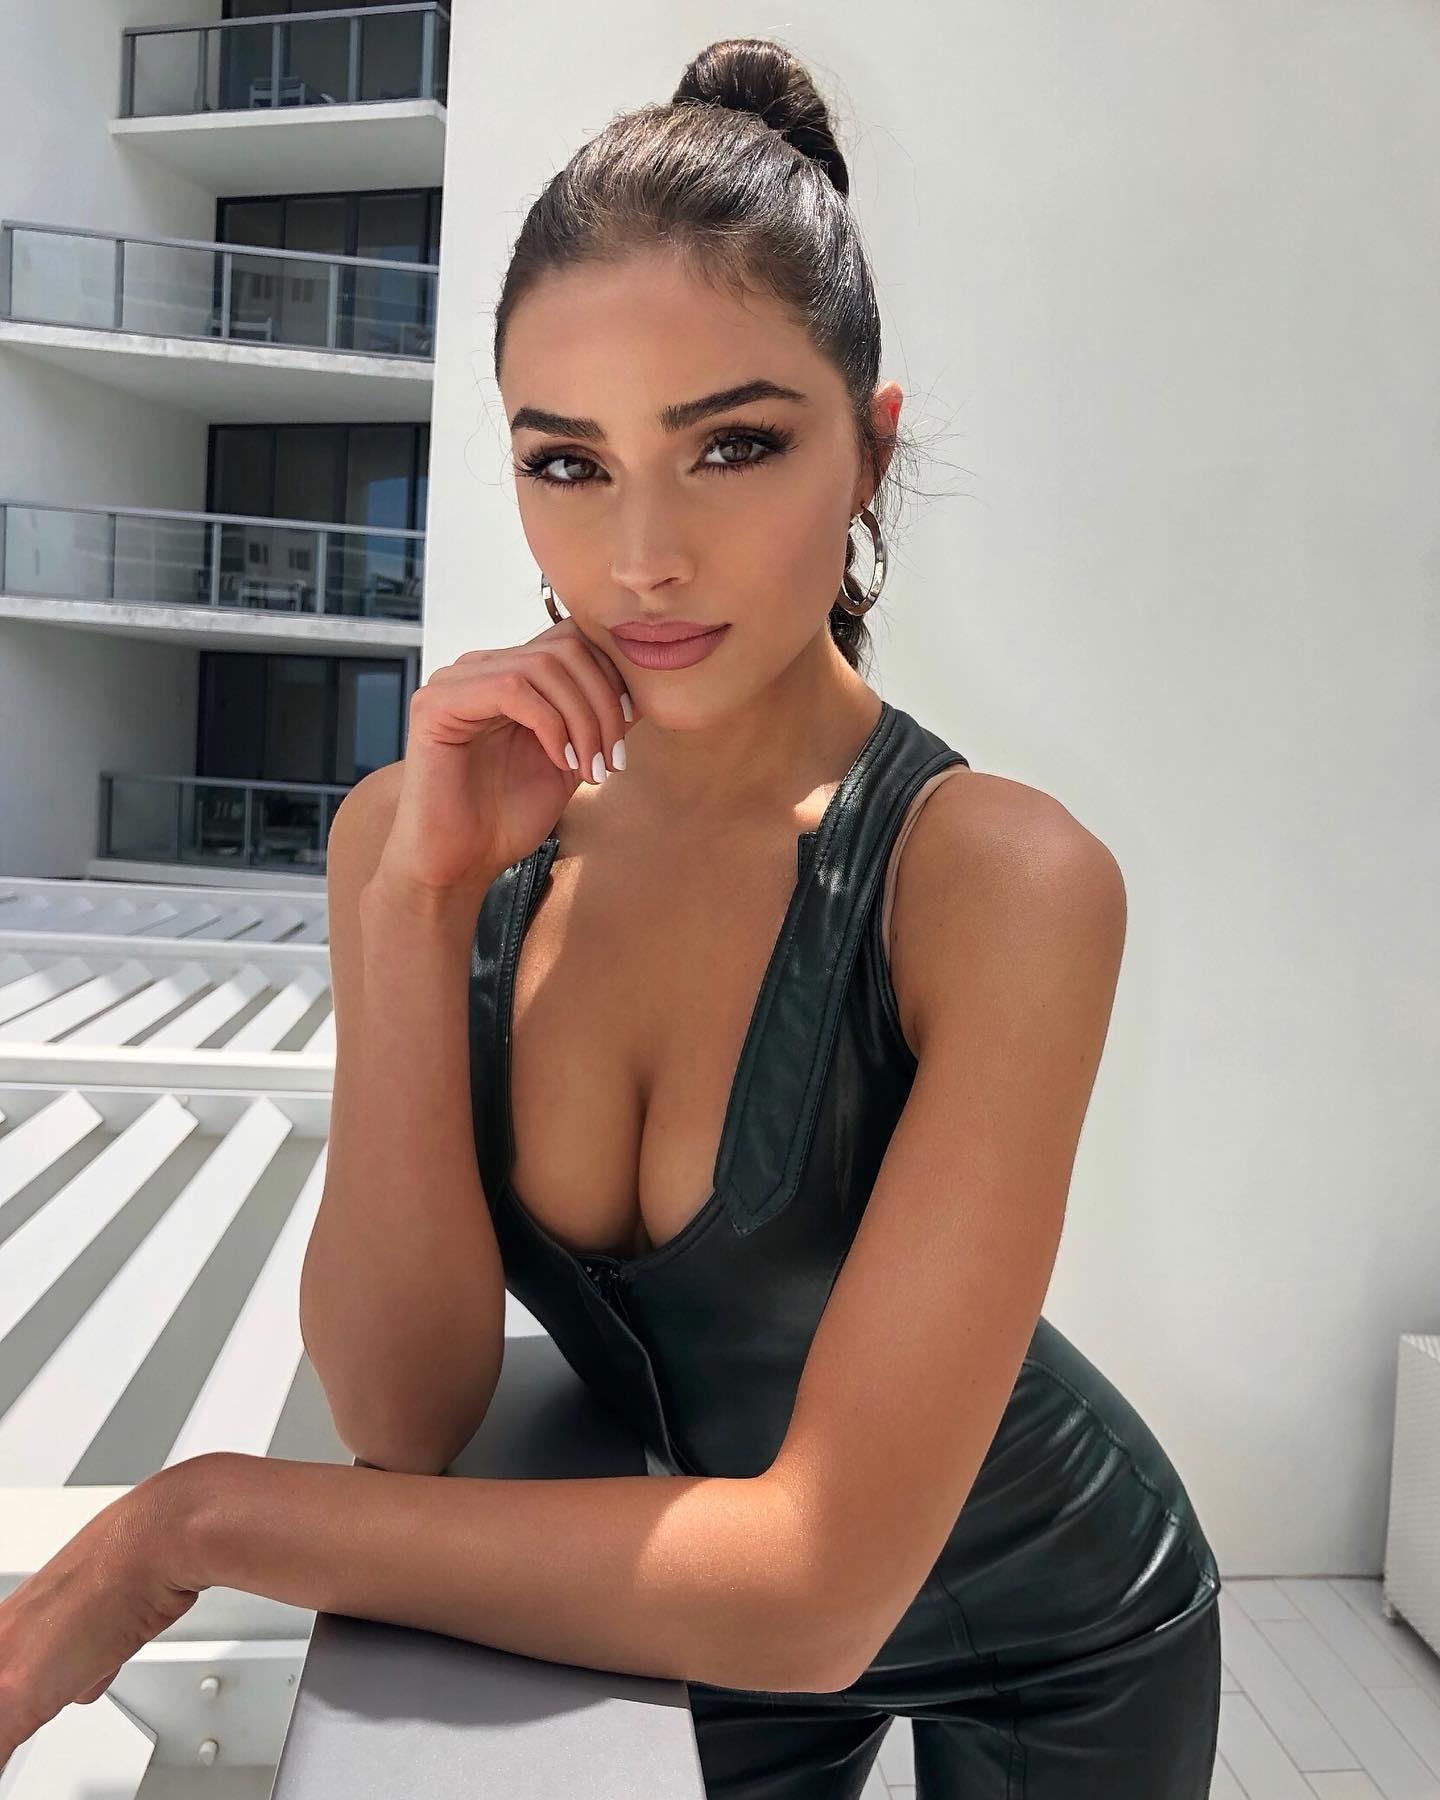 Olivia Culpo 2019 : Olivia Culpo – @oliviaculpo personal photos-10